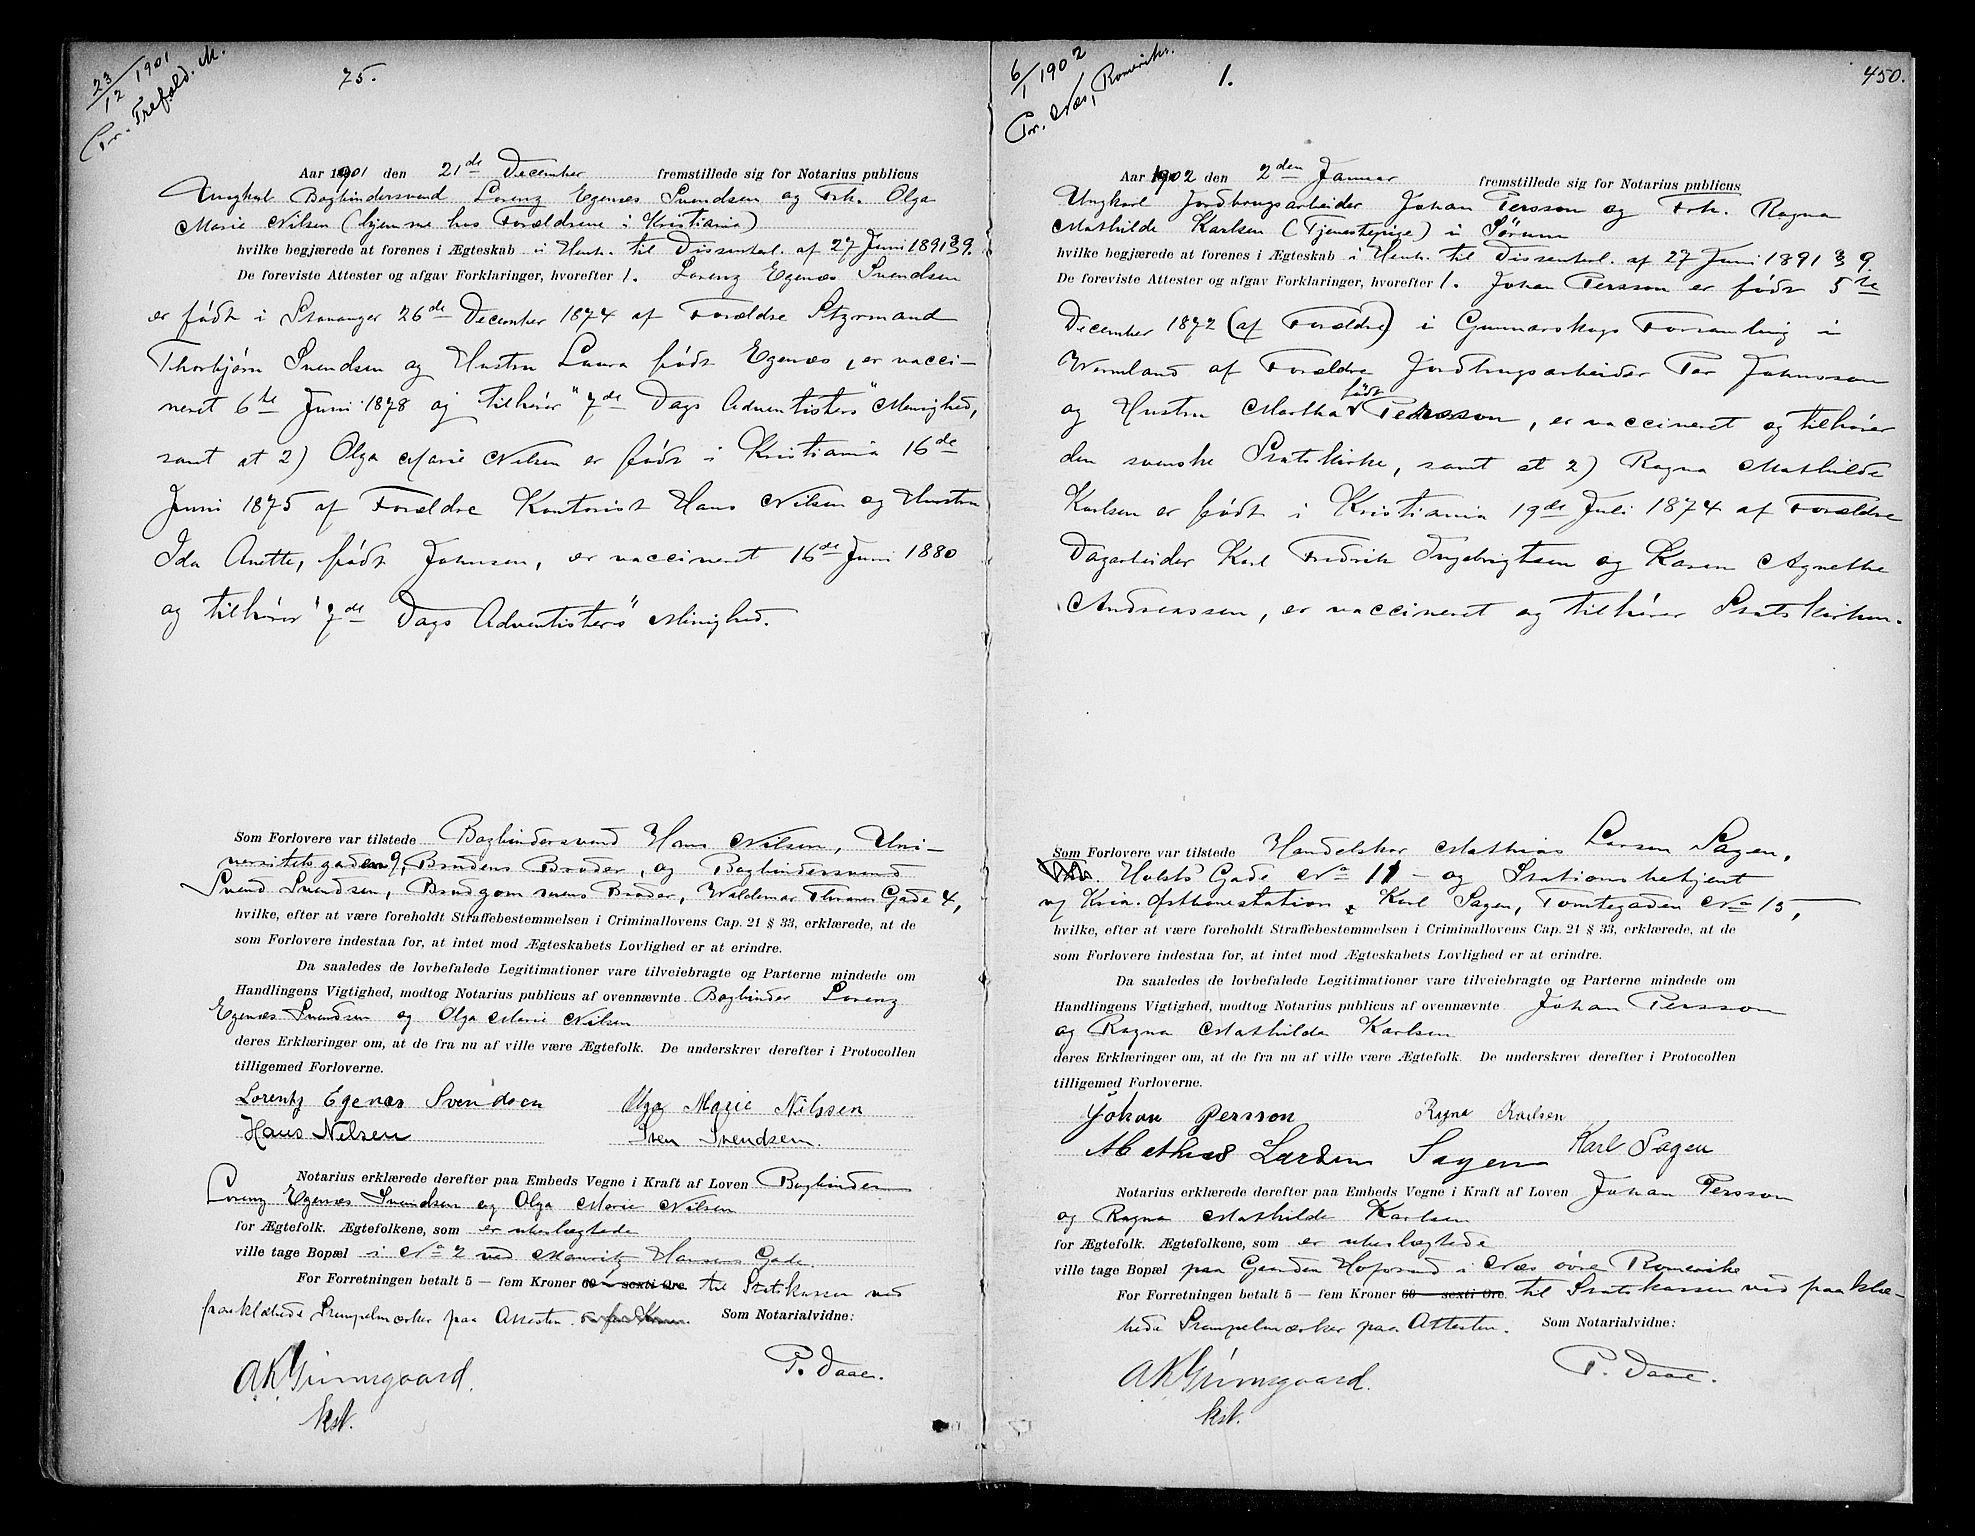 SAO, Oslo byfogd avd. I, L/Lb/Lbb/L0005: Notarialprotokoll, rekke II: Vigsler, 1897-1902, s. 449b-450a